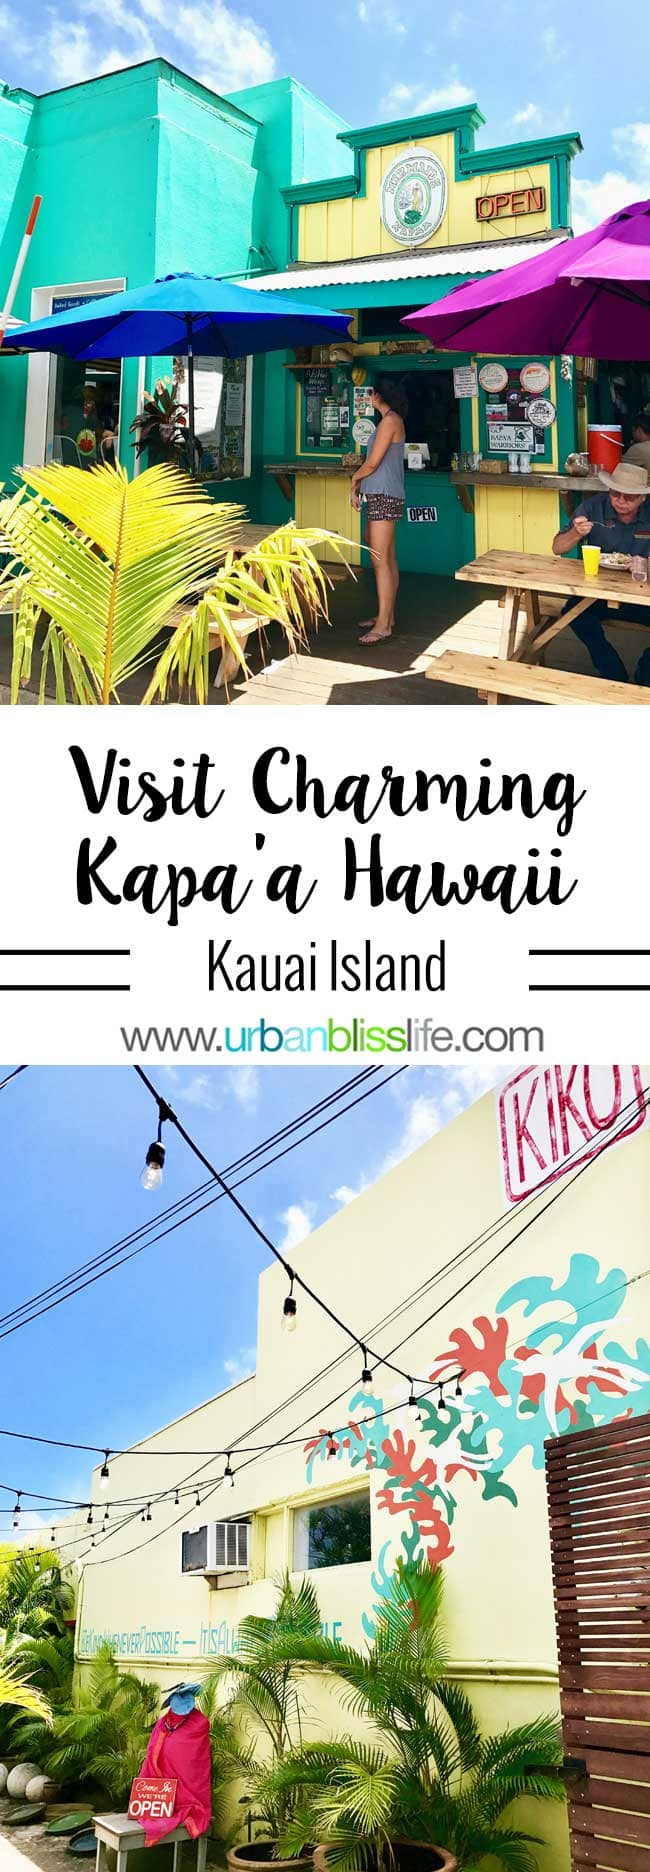 Kapaa Hawaii Kauai island travel tips on UrbanBlissLife.com